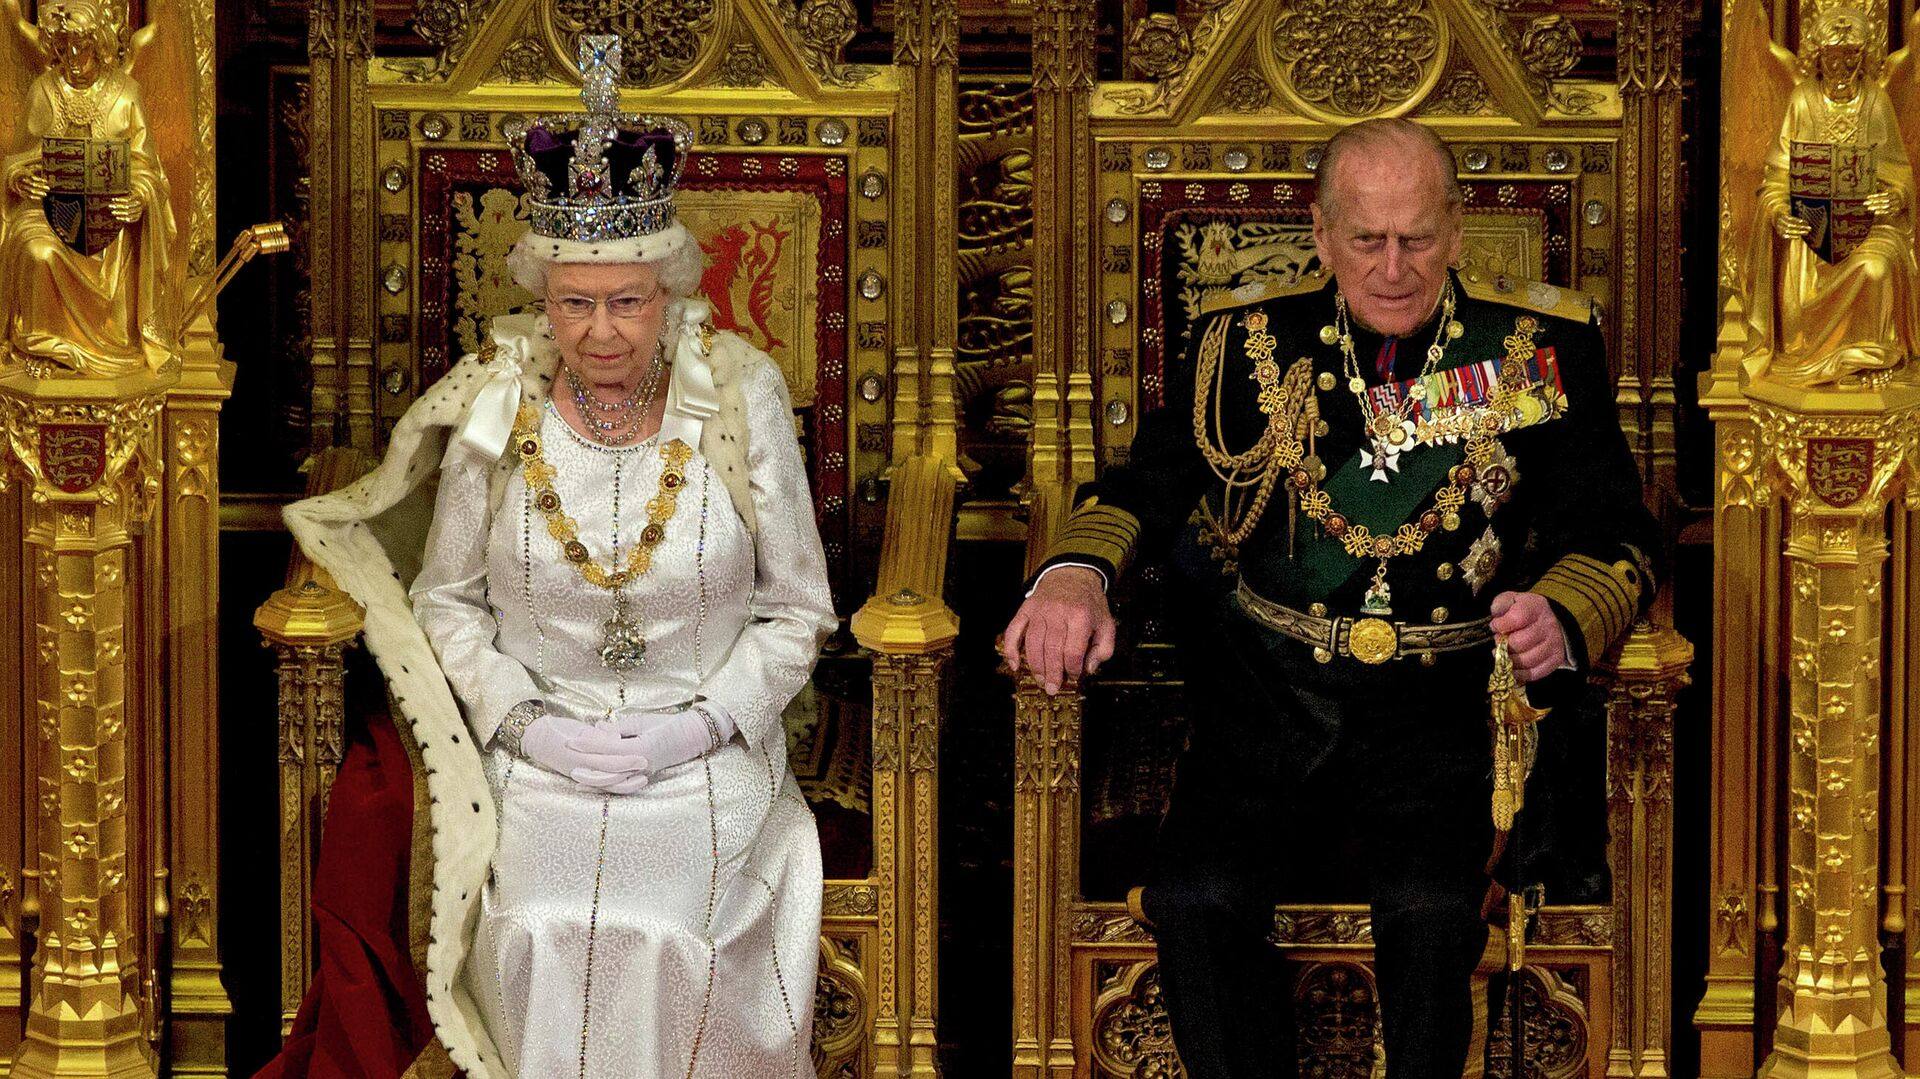 Королева Великобритании Елизавета II и ее супруг герцог Эдинбургский  - РИА Новости, 1920, 09.04.2021